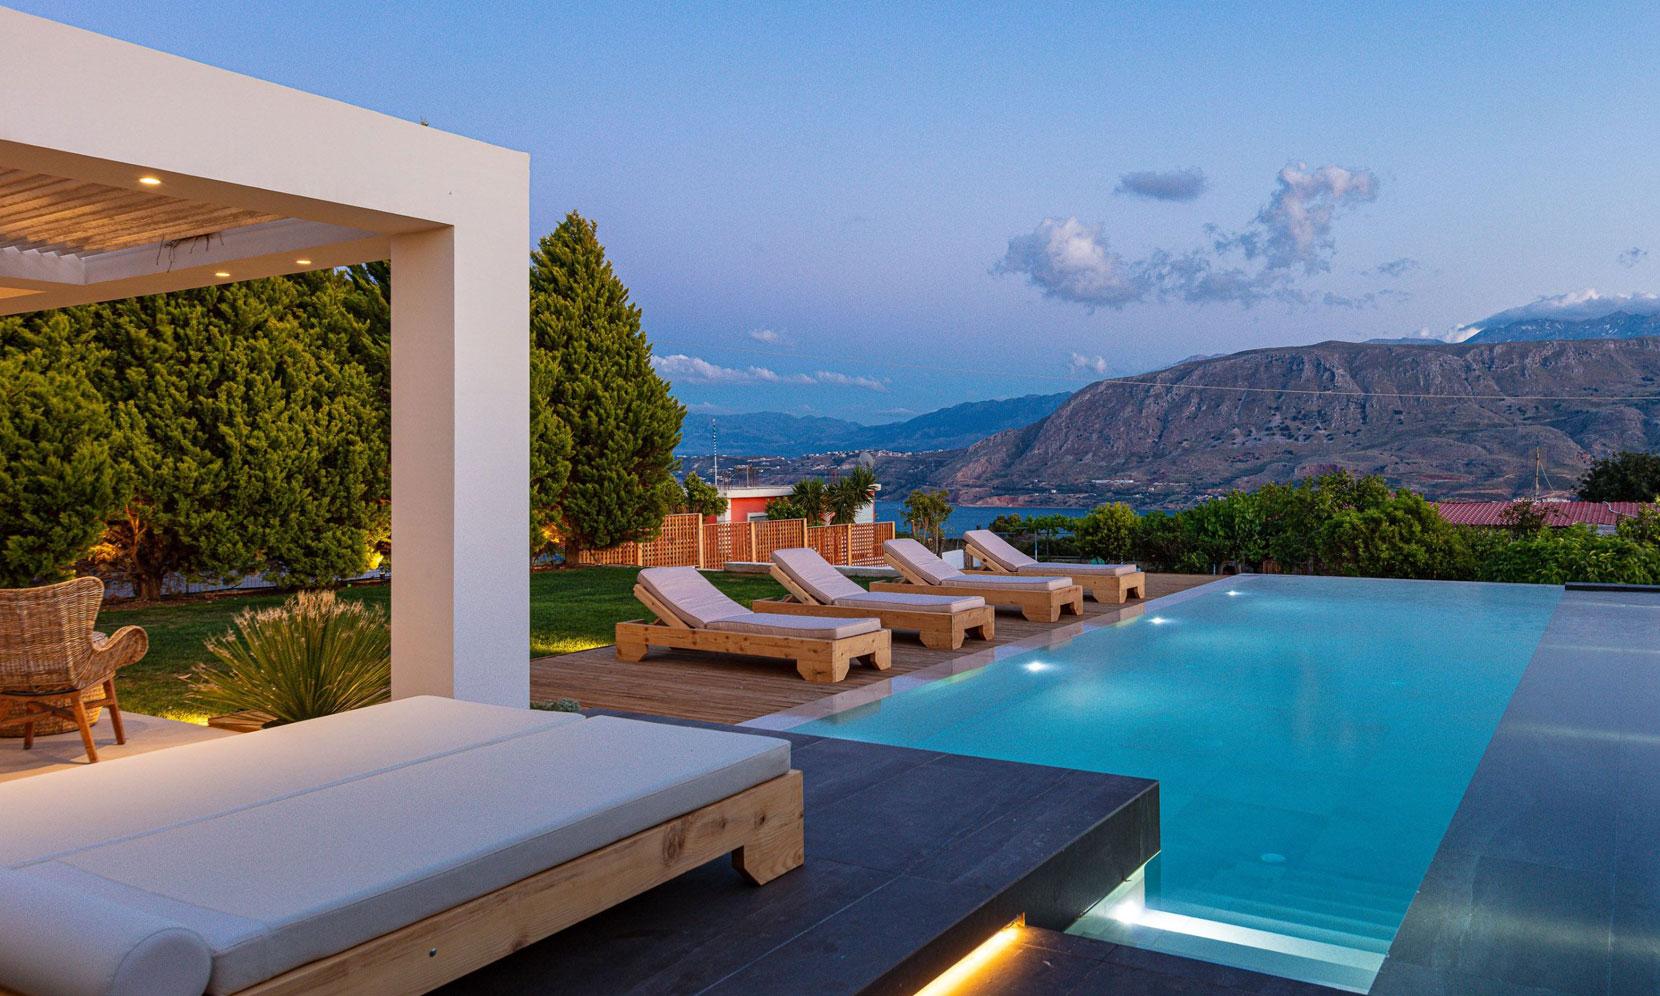 Crete Villa Amaryllis jumbotron image